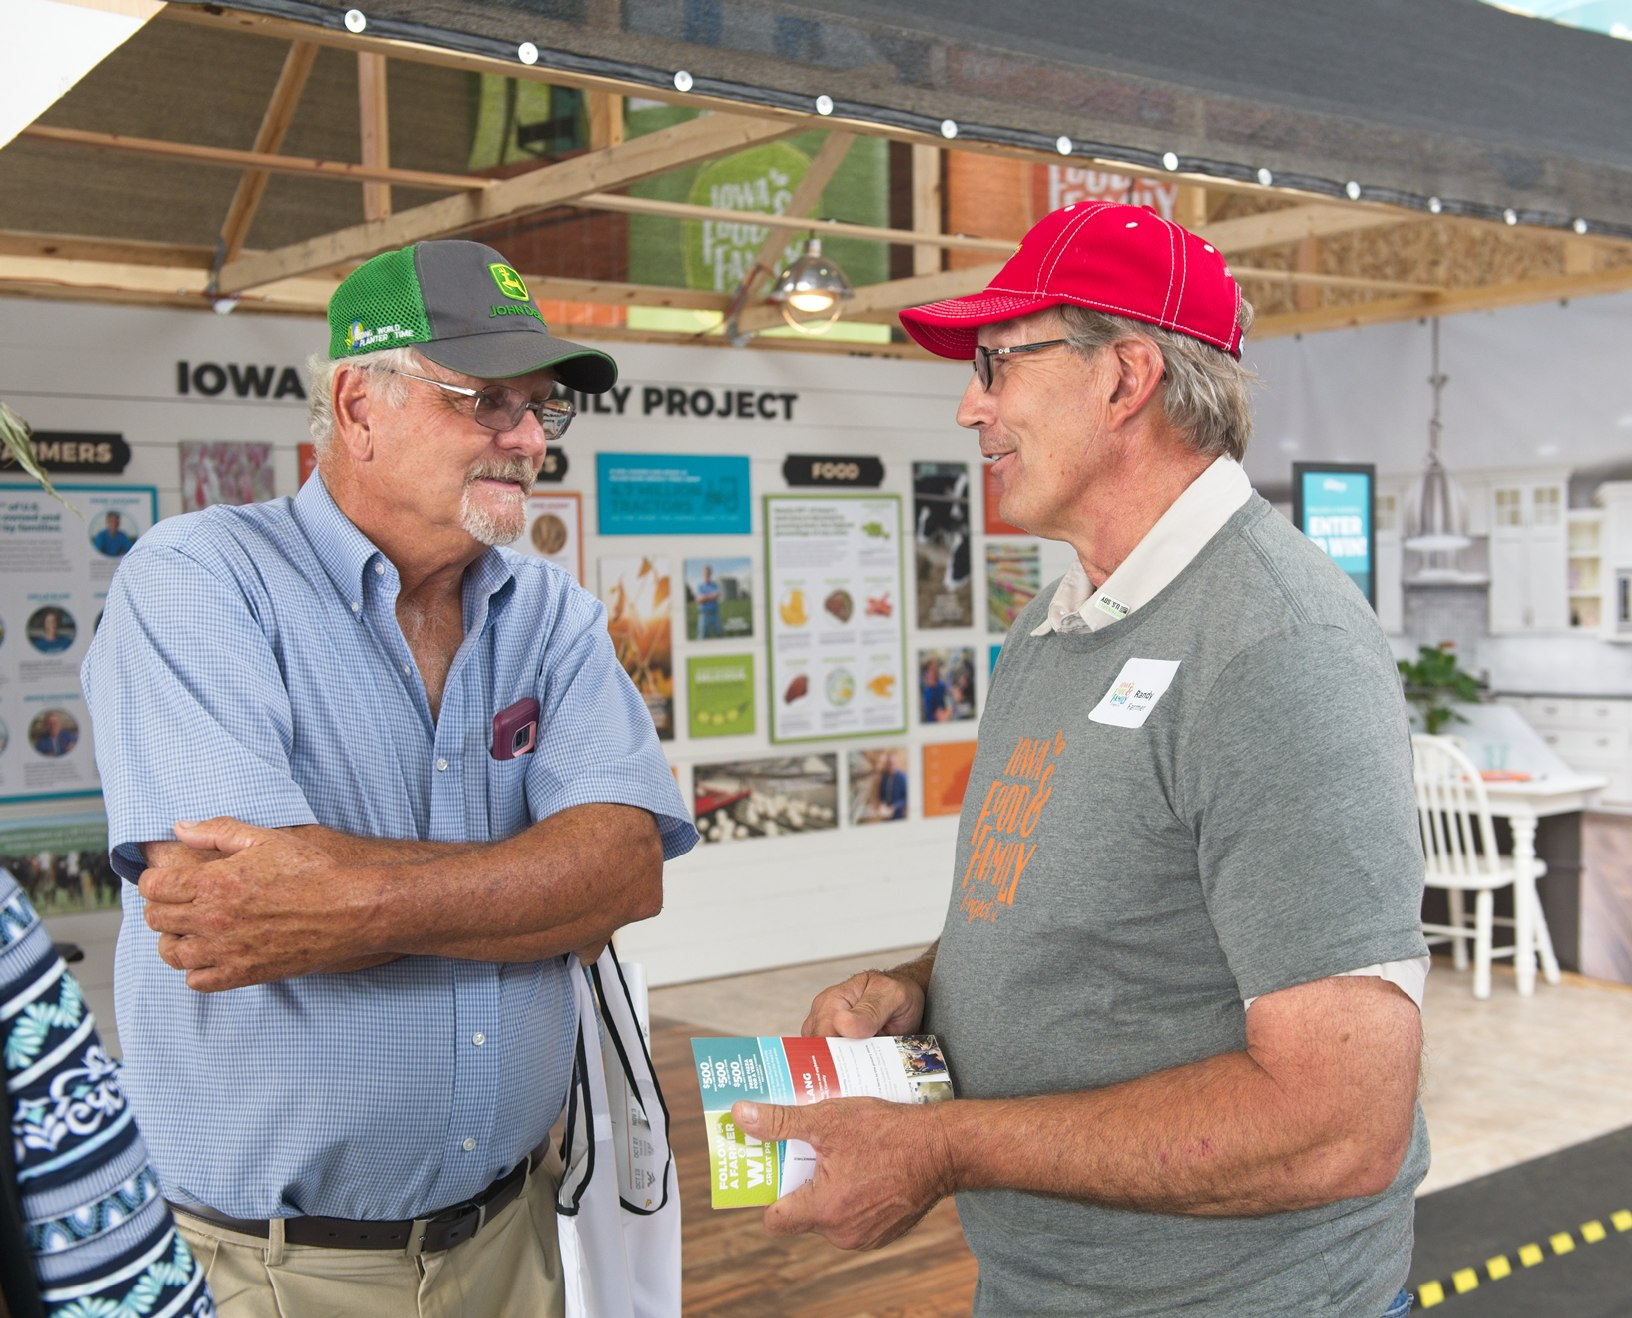 Randy Souder, a farmer from Rockwell City, volunteers at the Iowa FFP Iowa State Fair display. Photo credit: Joseph L. Murphy/Iowa Soybean Association